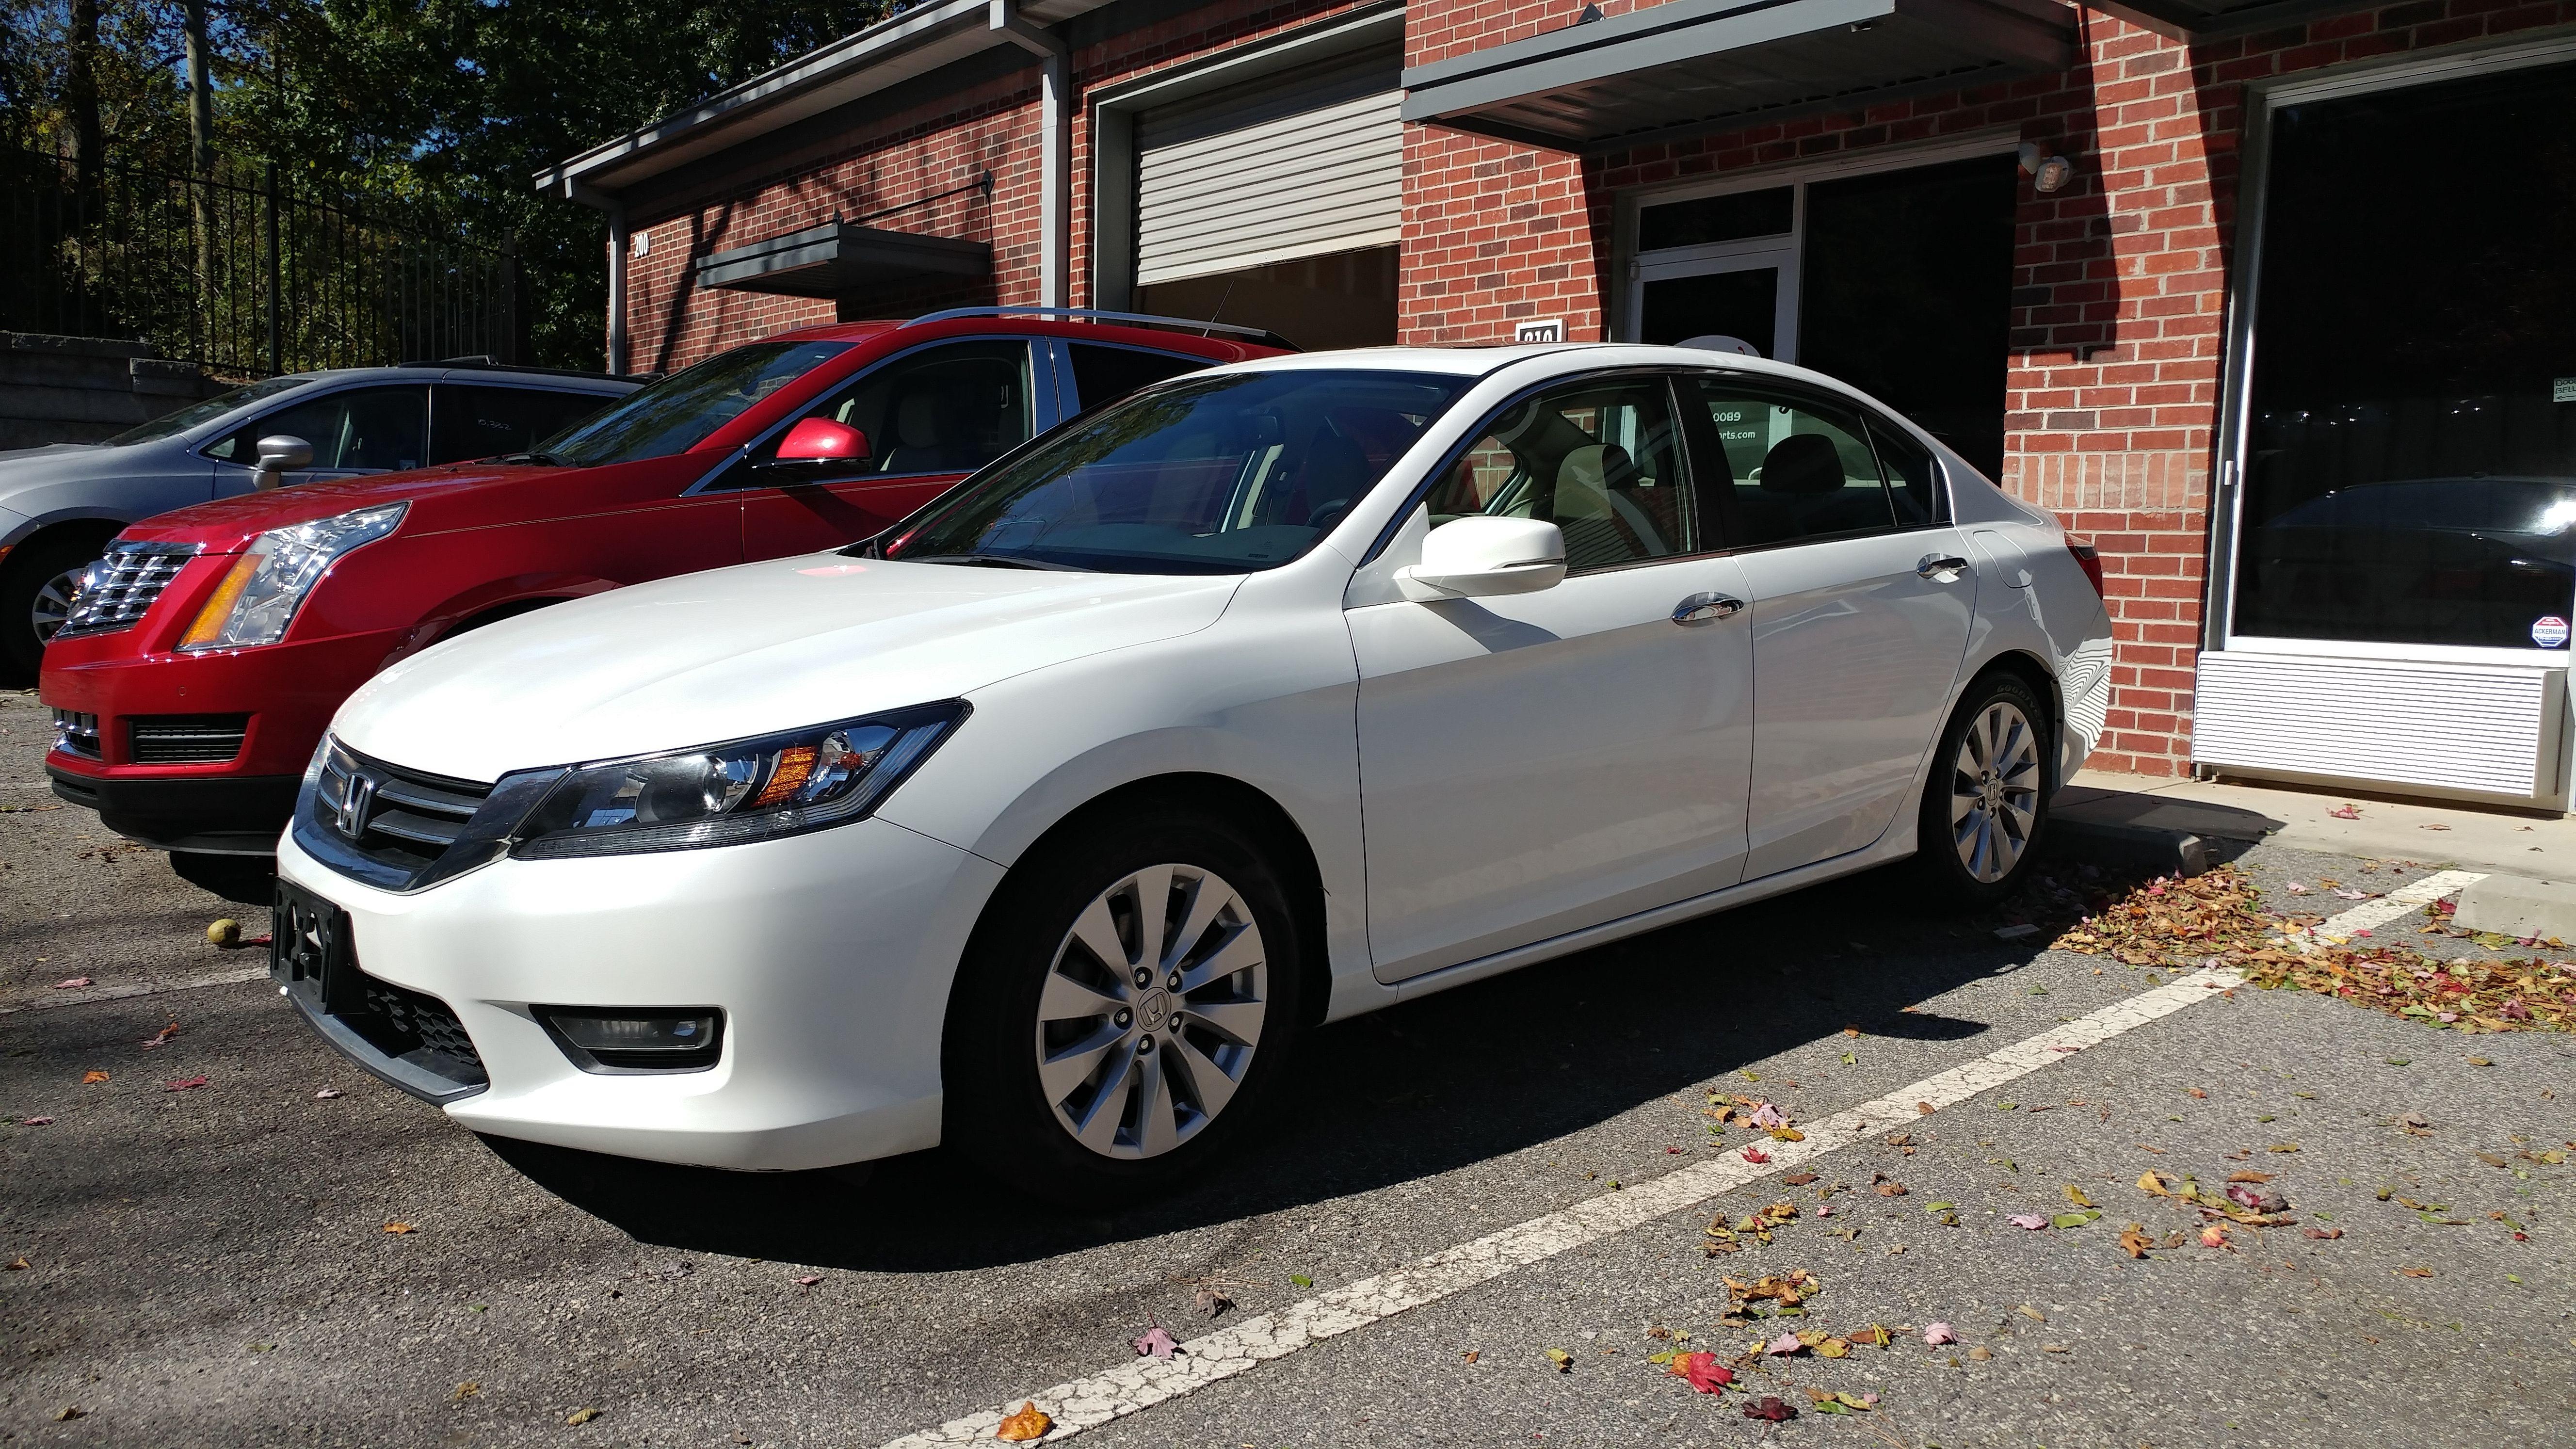 $18 250 2014 Honda Accord EX L sedan Orchid White Pearl on Tan